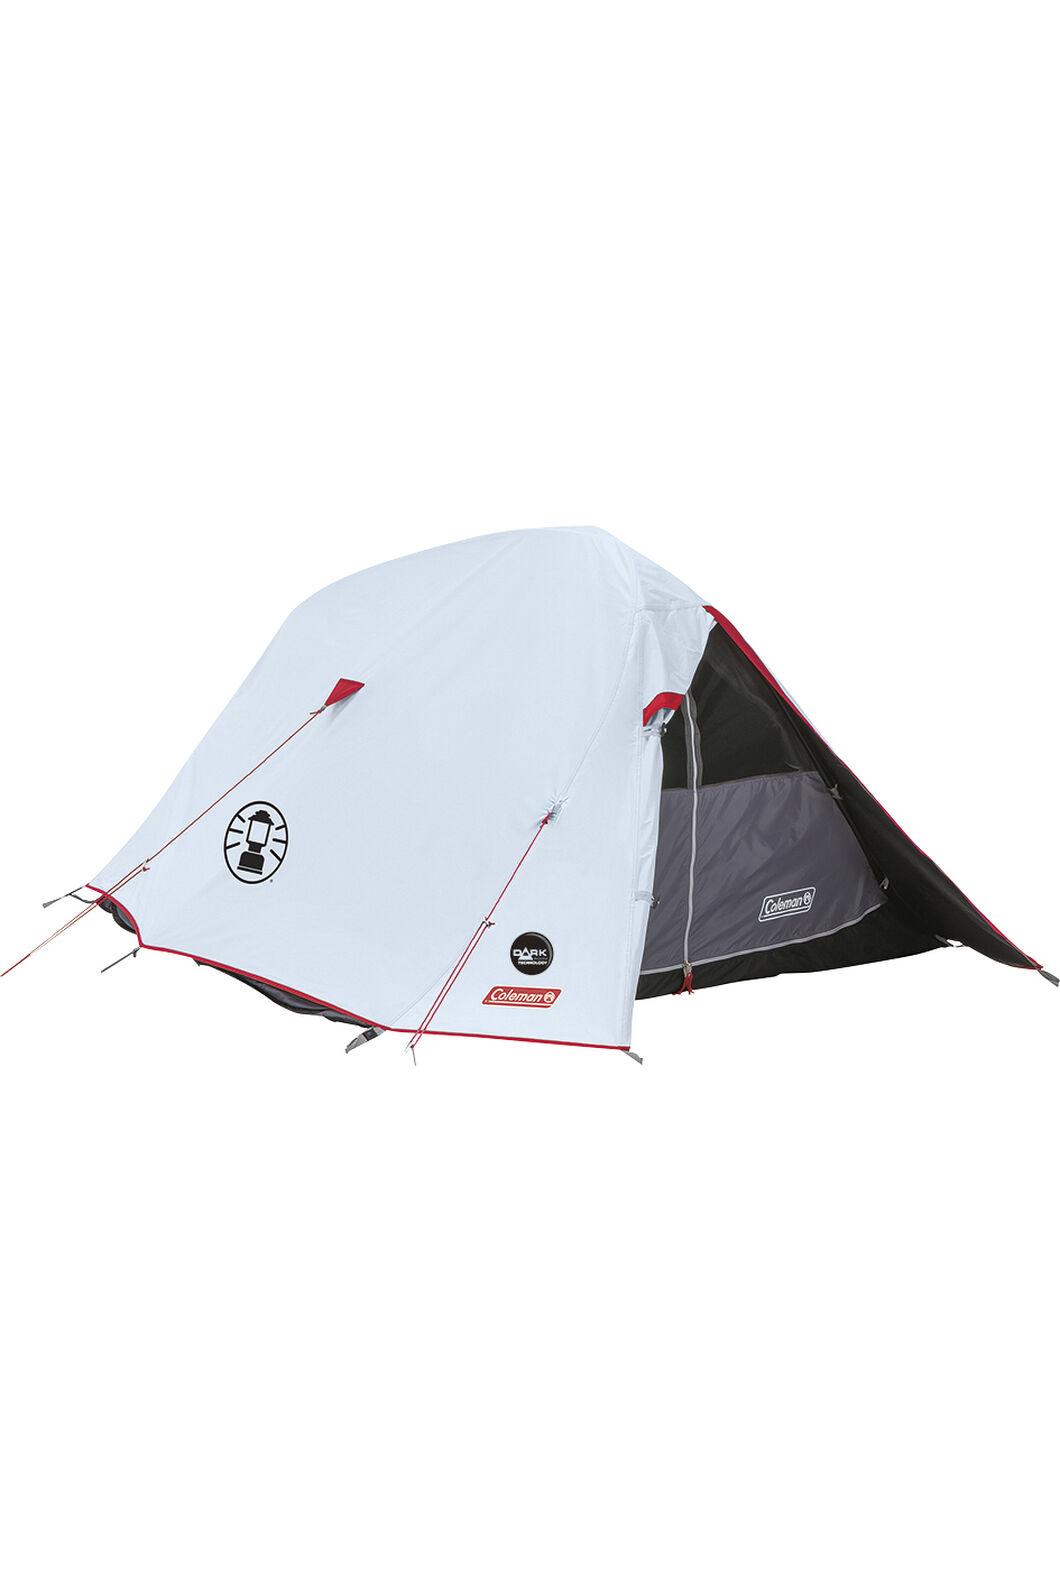 coleman 2 person pop up tent review